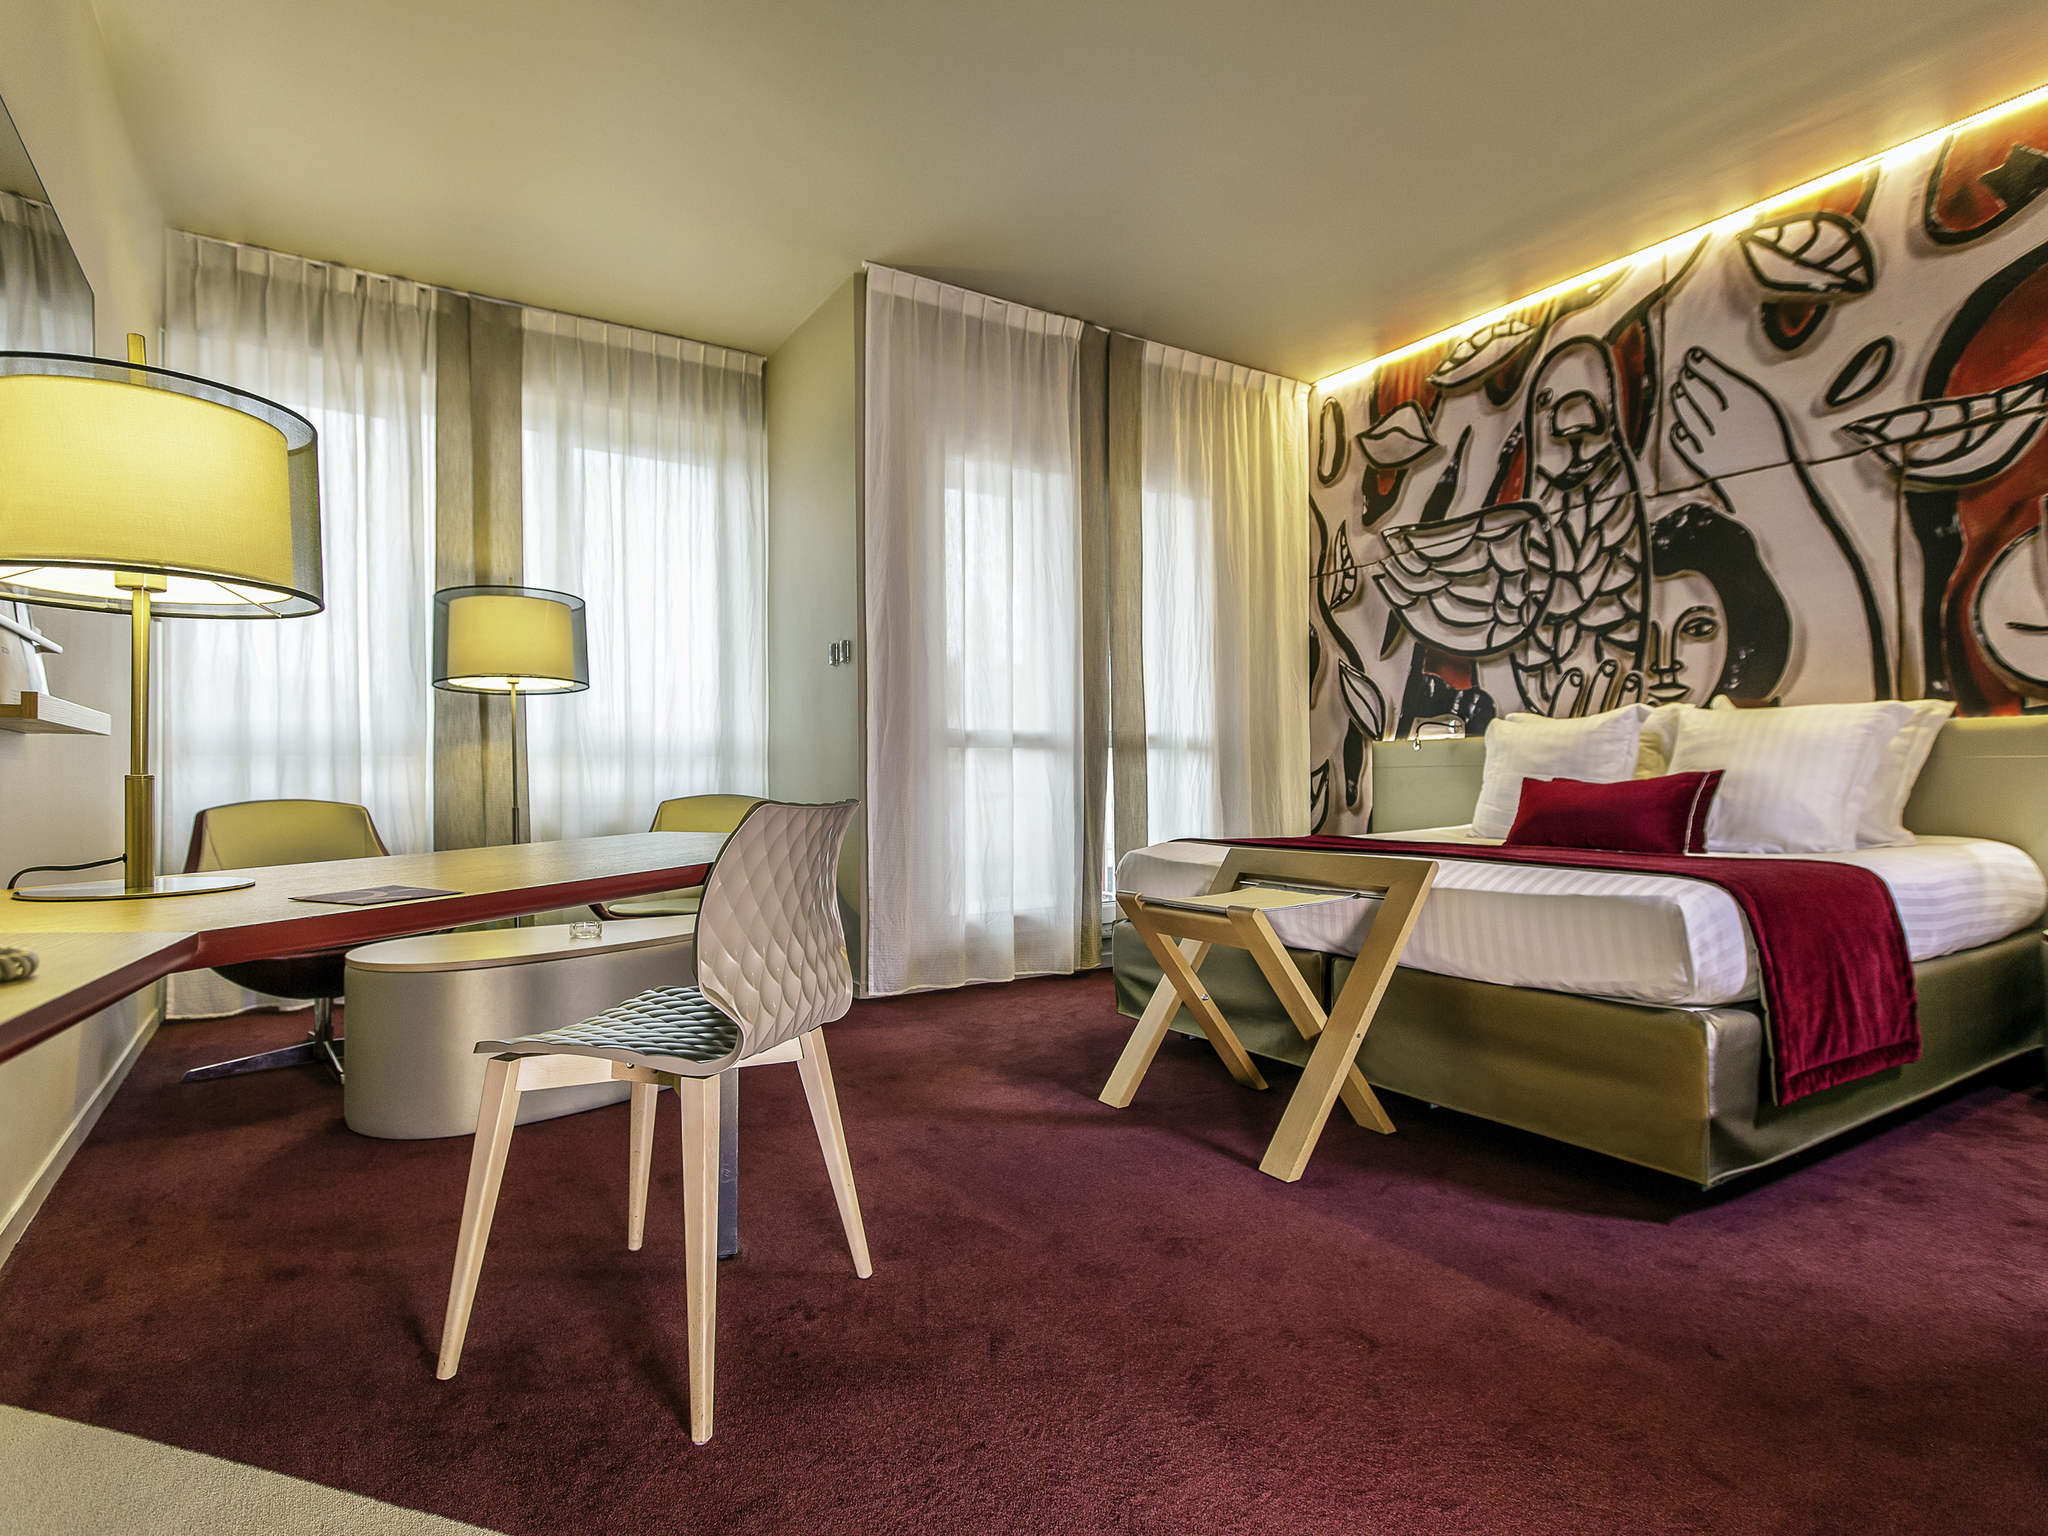 فندق - Hôtel Mercure Limoges Royal Limousin